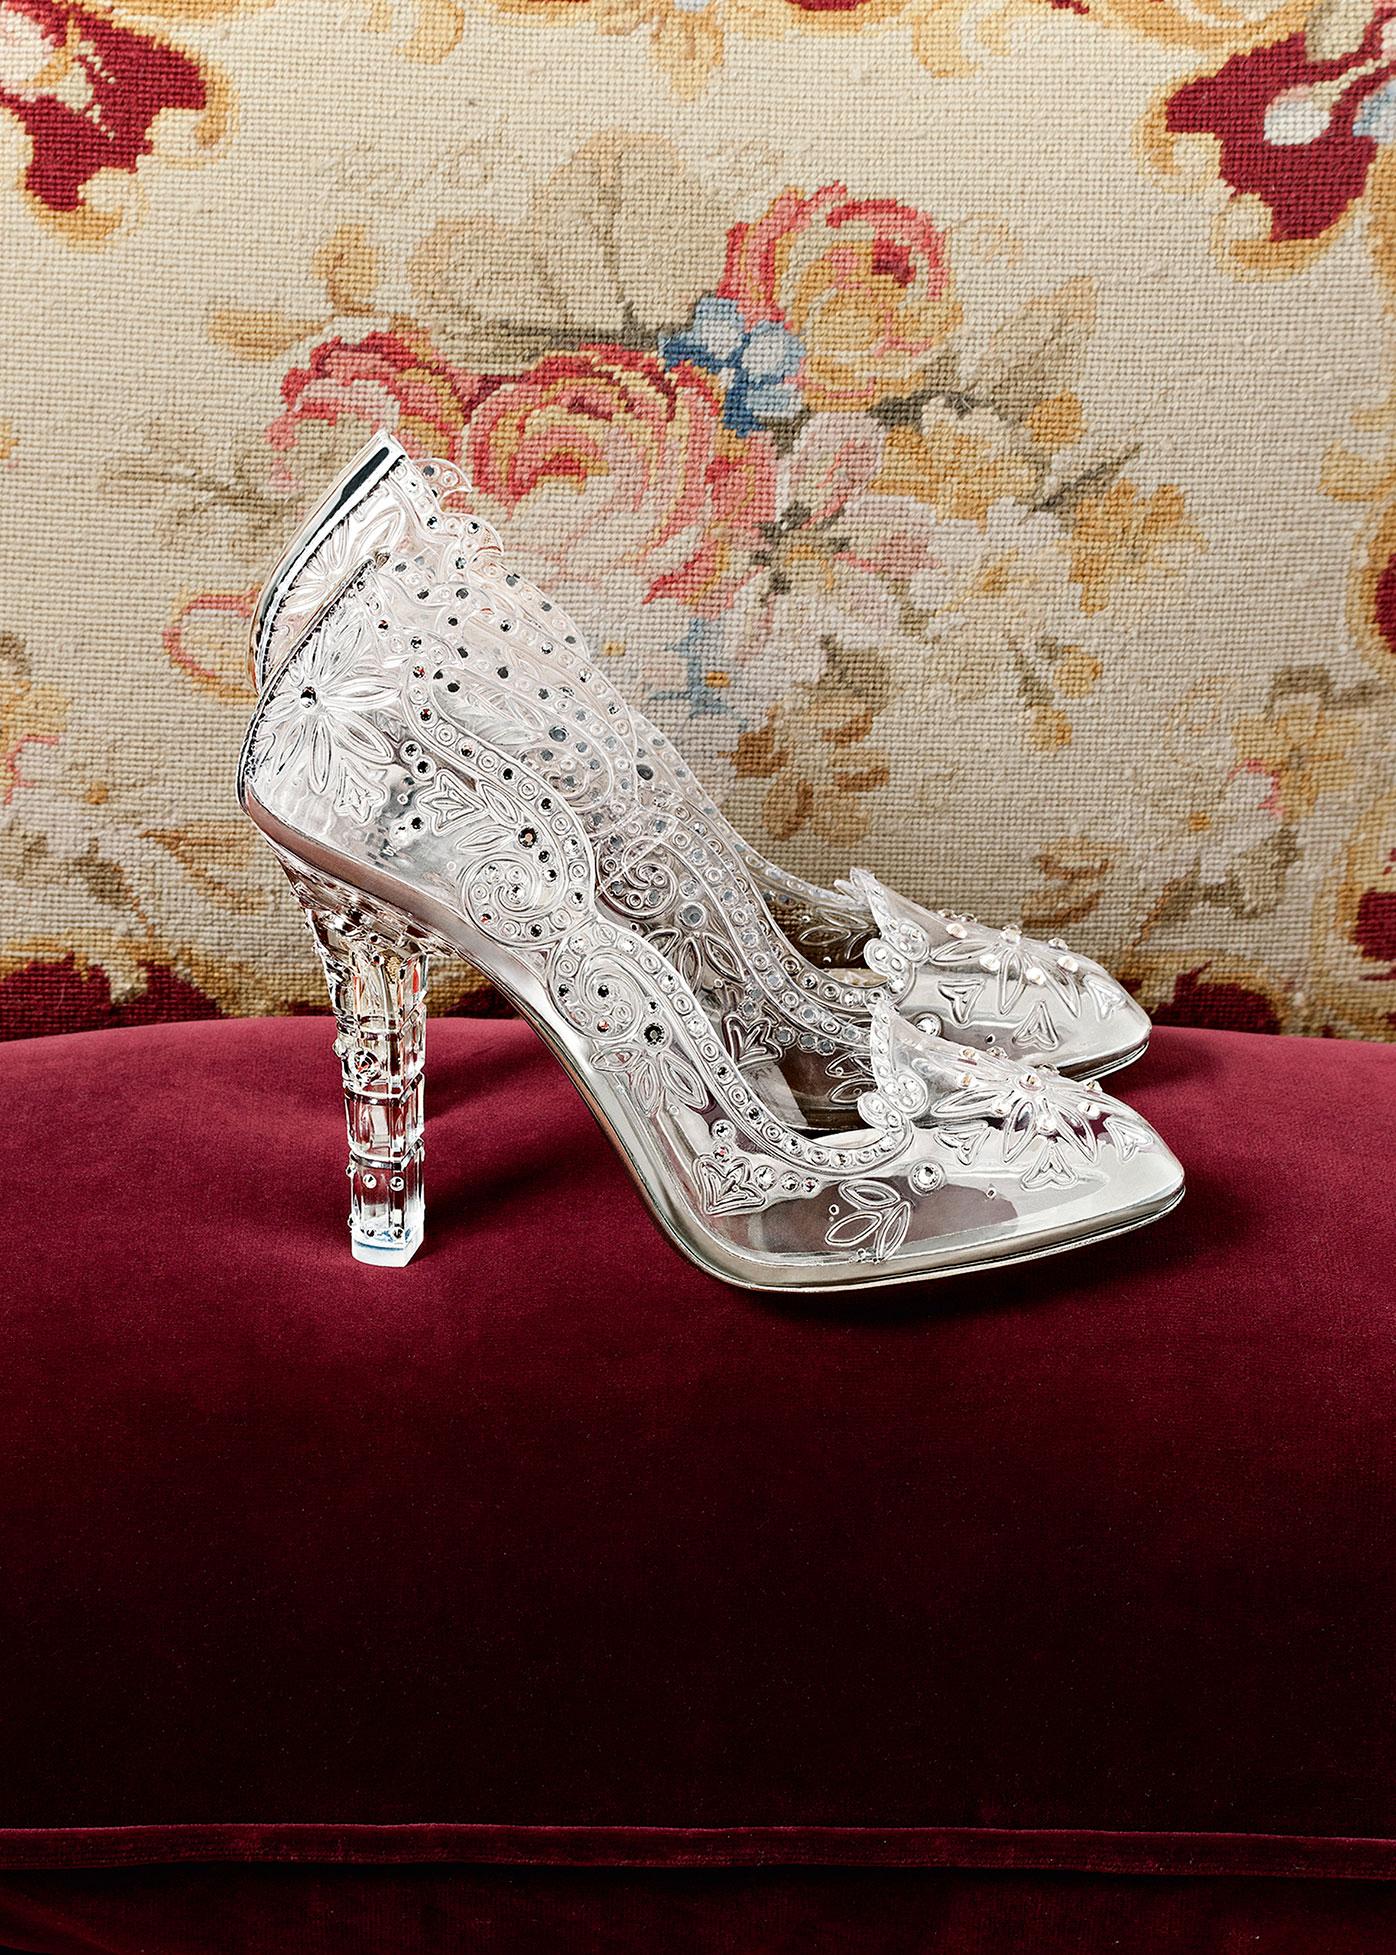 Femminili GabbanaScarpe Trasparenti Nome Sposa Dolce E Da In iPOkXZu